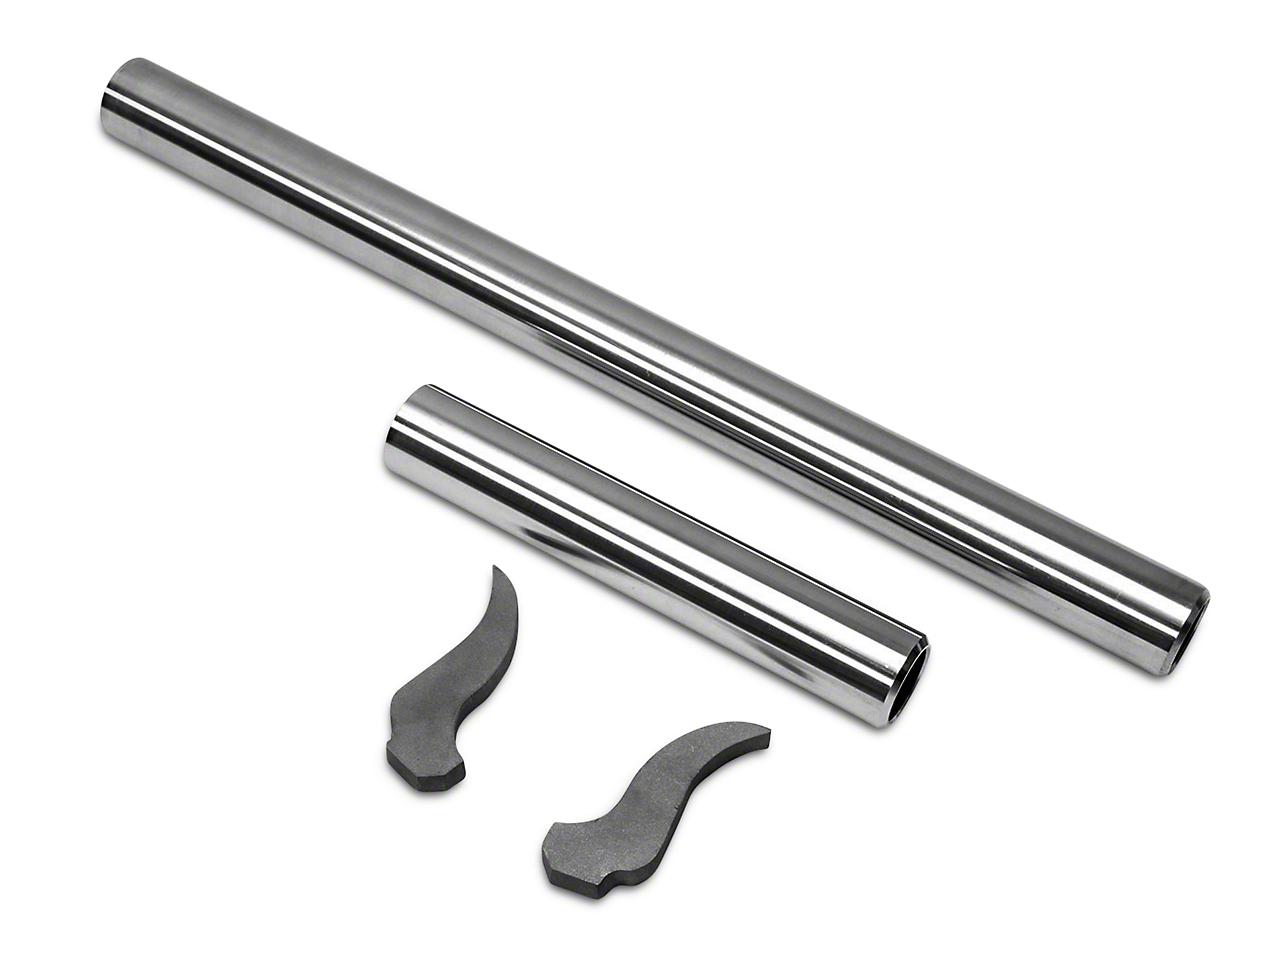 Teraflex Front Axle Sleeve Kit w/ Gussets (07-18 Wrangler JK)